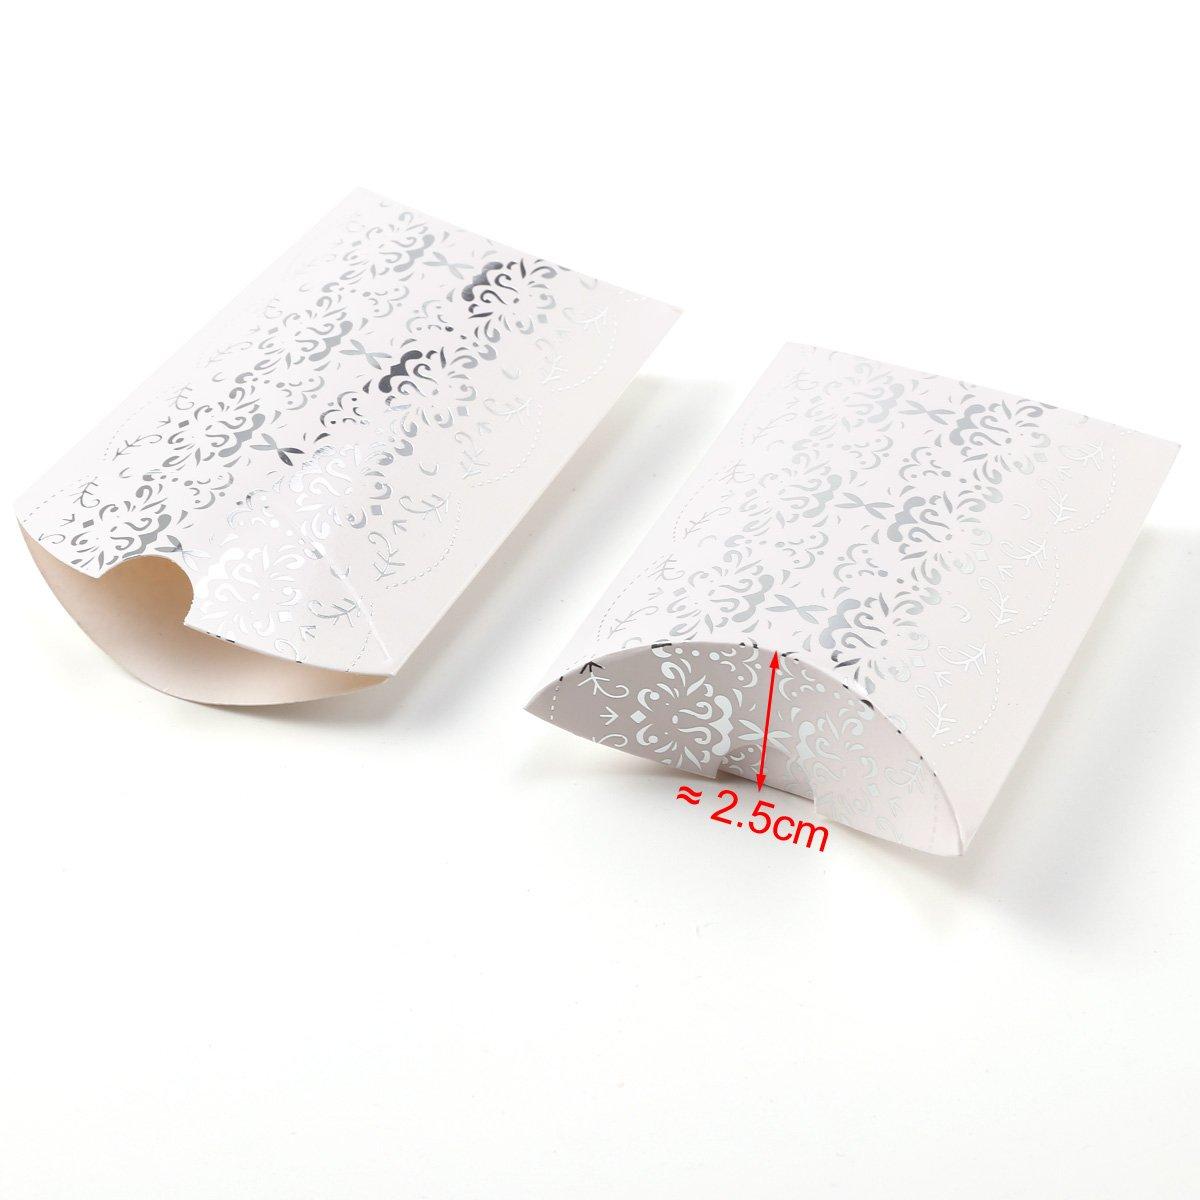 1f15eae99 CLE DE TOUS - 50pcs Cajitas de boda dulces Pequeños regalos Detalles para  bodas Cajas petaca Blanca con plateado: Amazon.es: Hogar